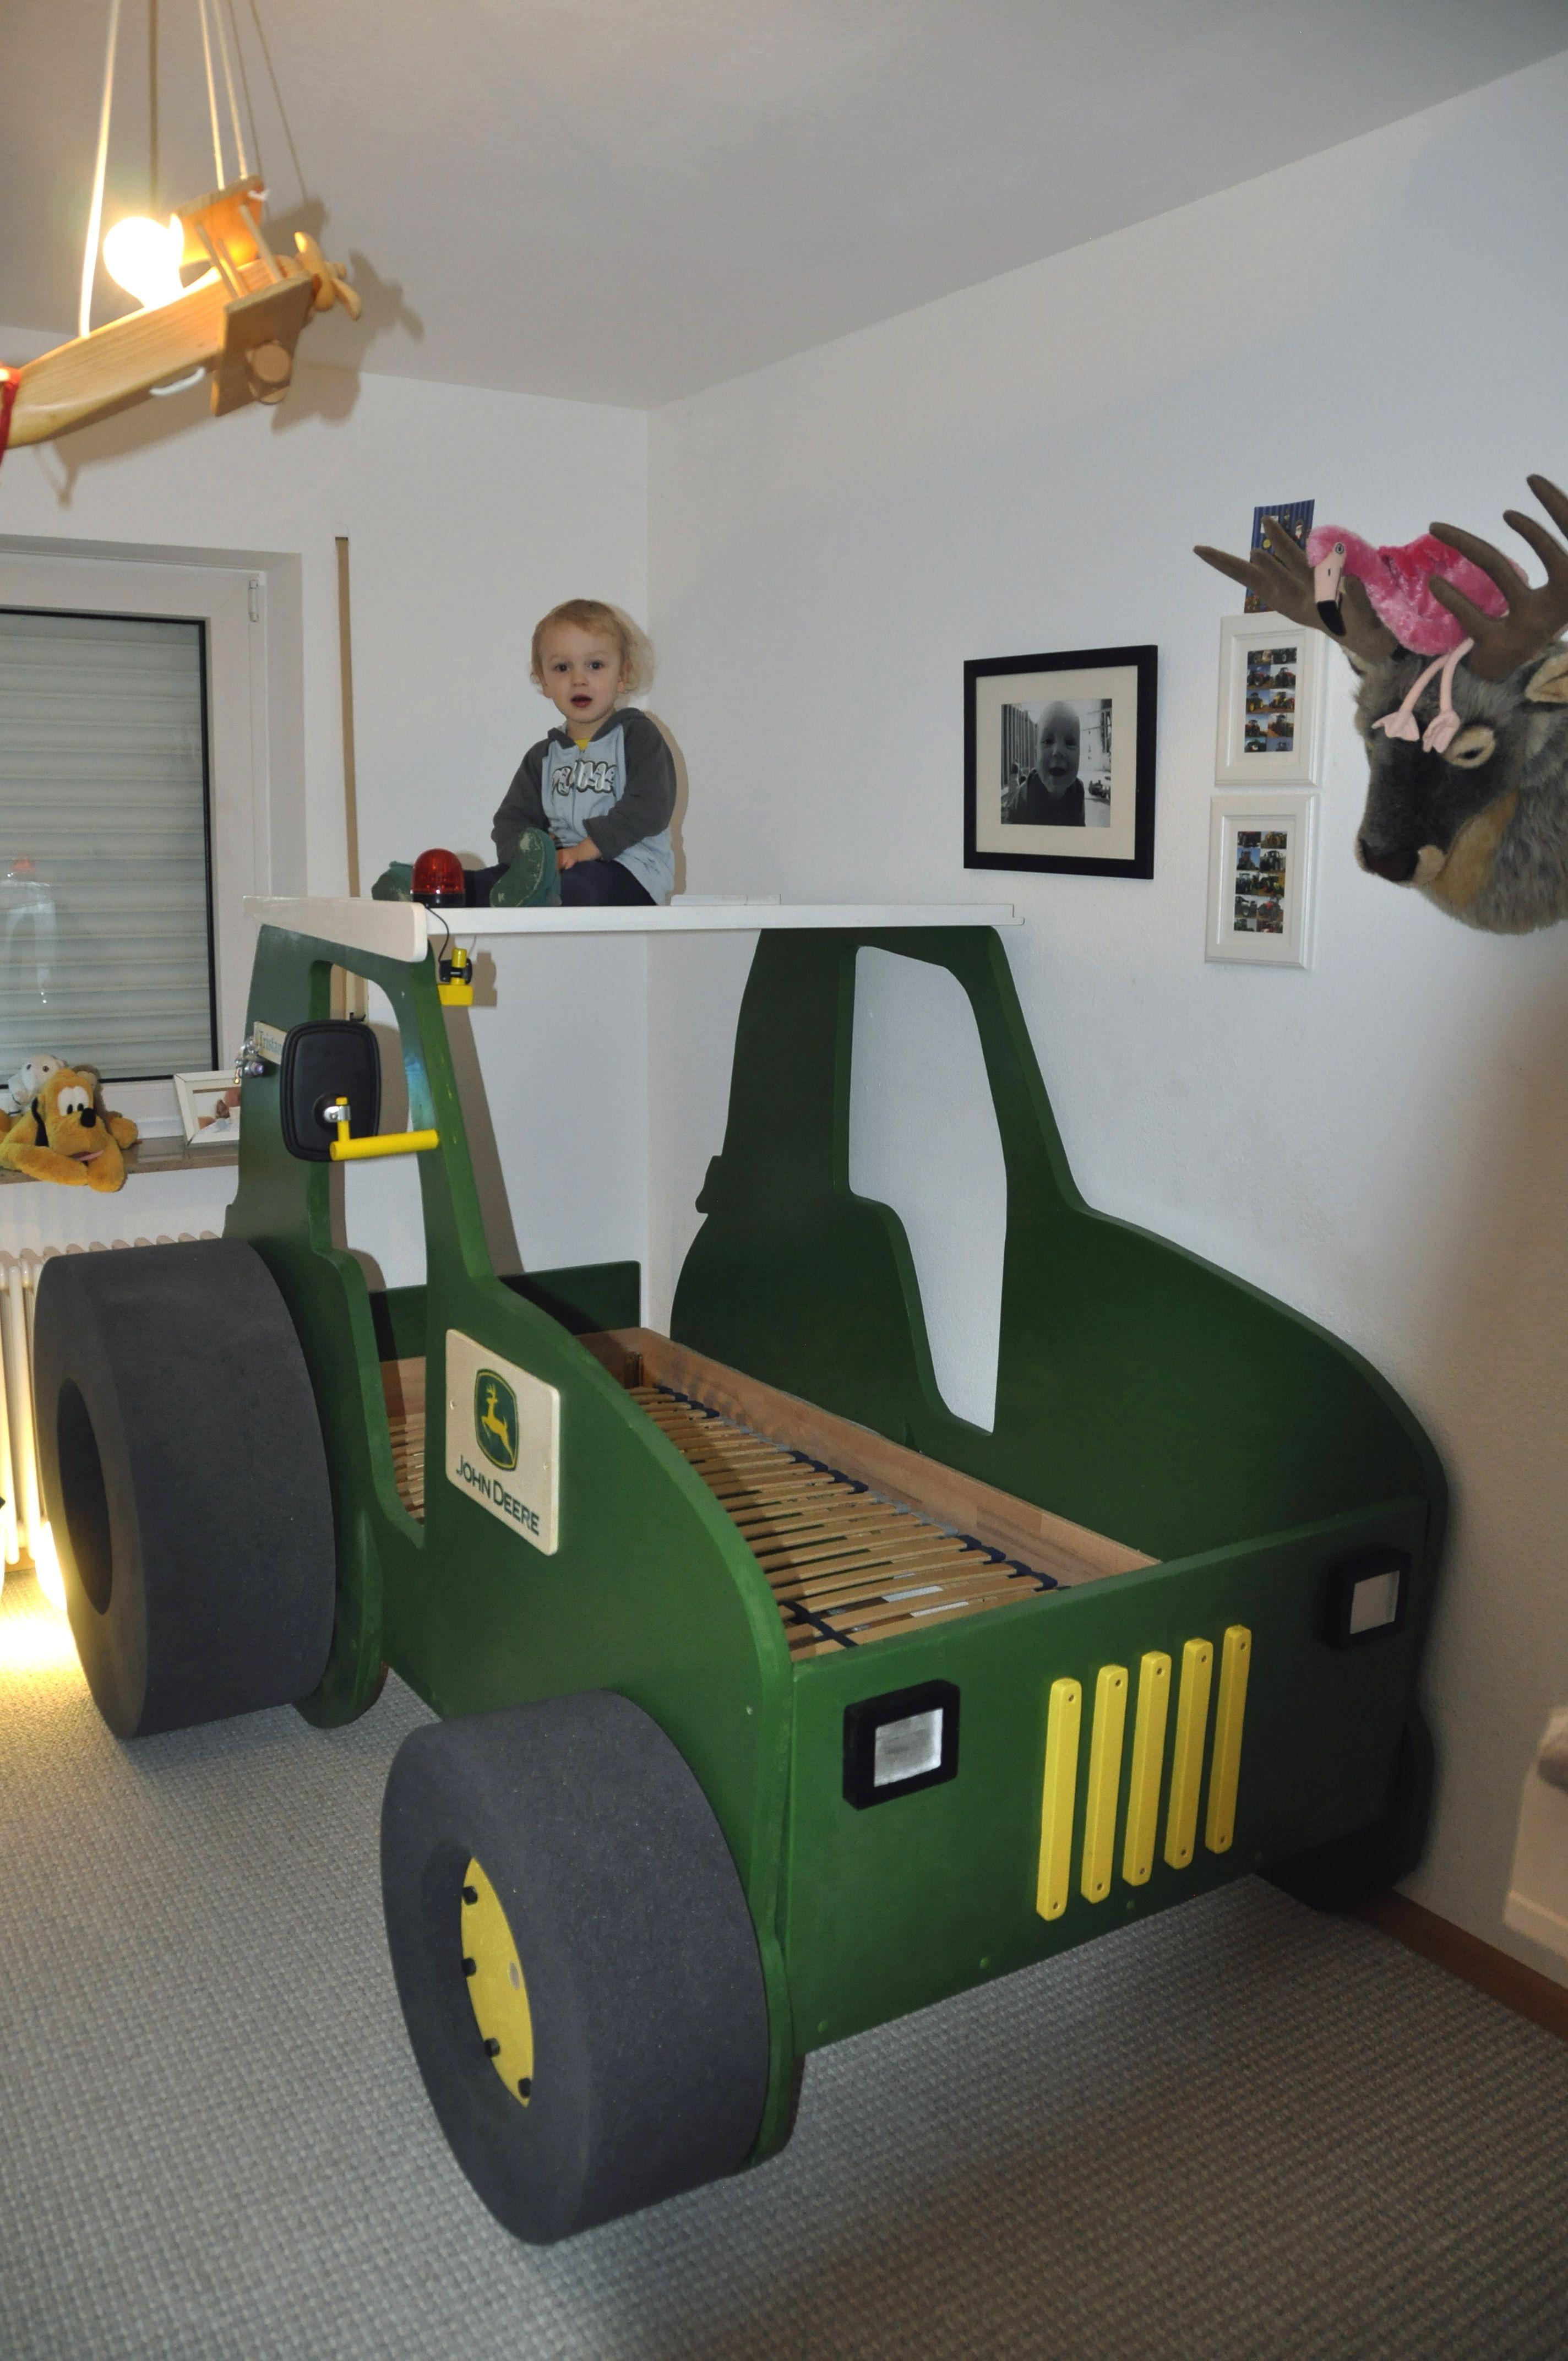 Der Enkel Freut Sich Nr 8 Traktor Als Kinderbett Kinder Bett Kinderbett Kinderbett Junge